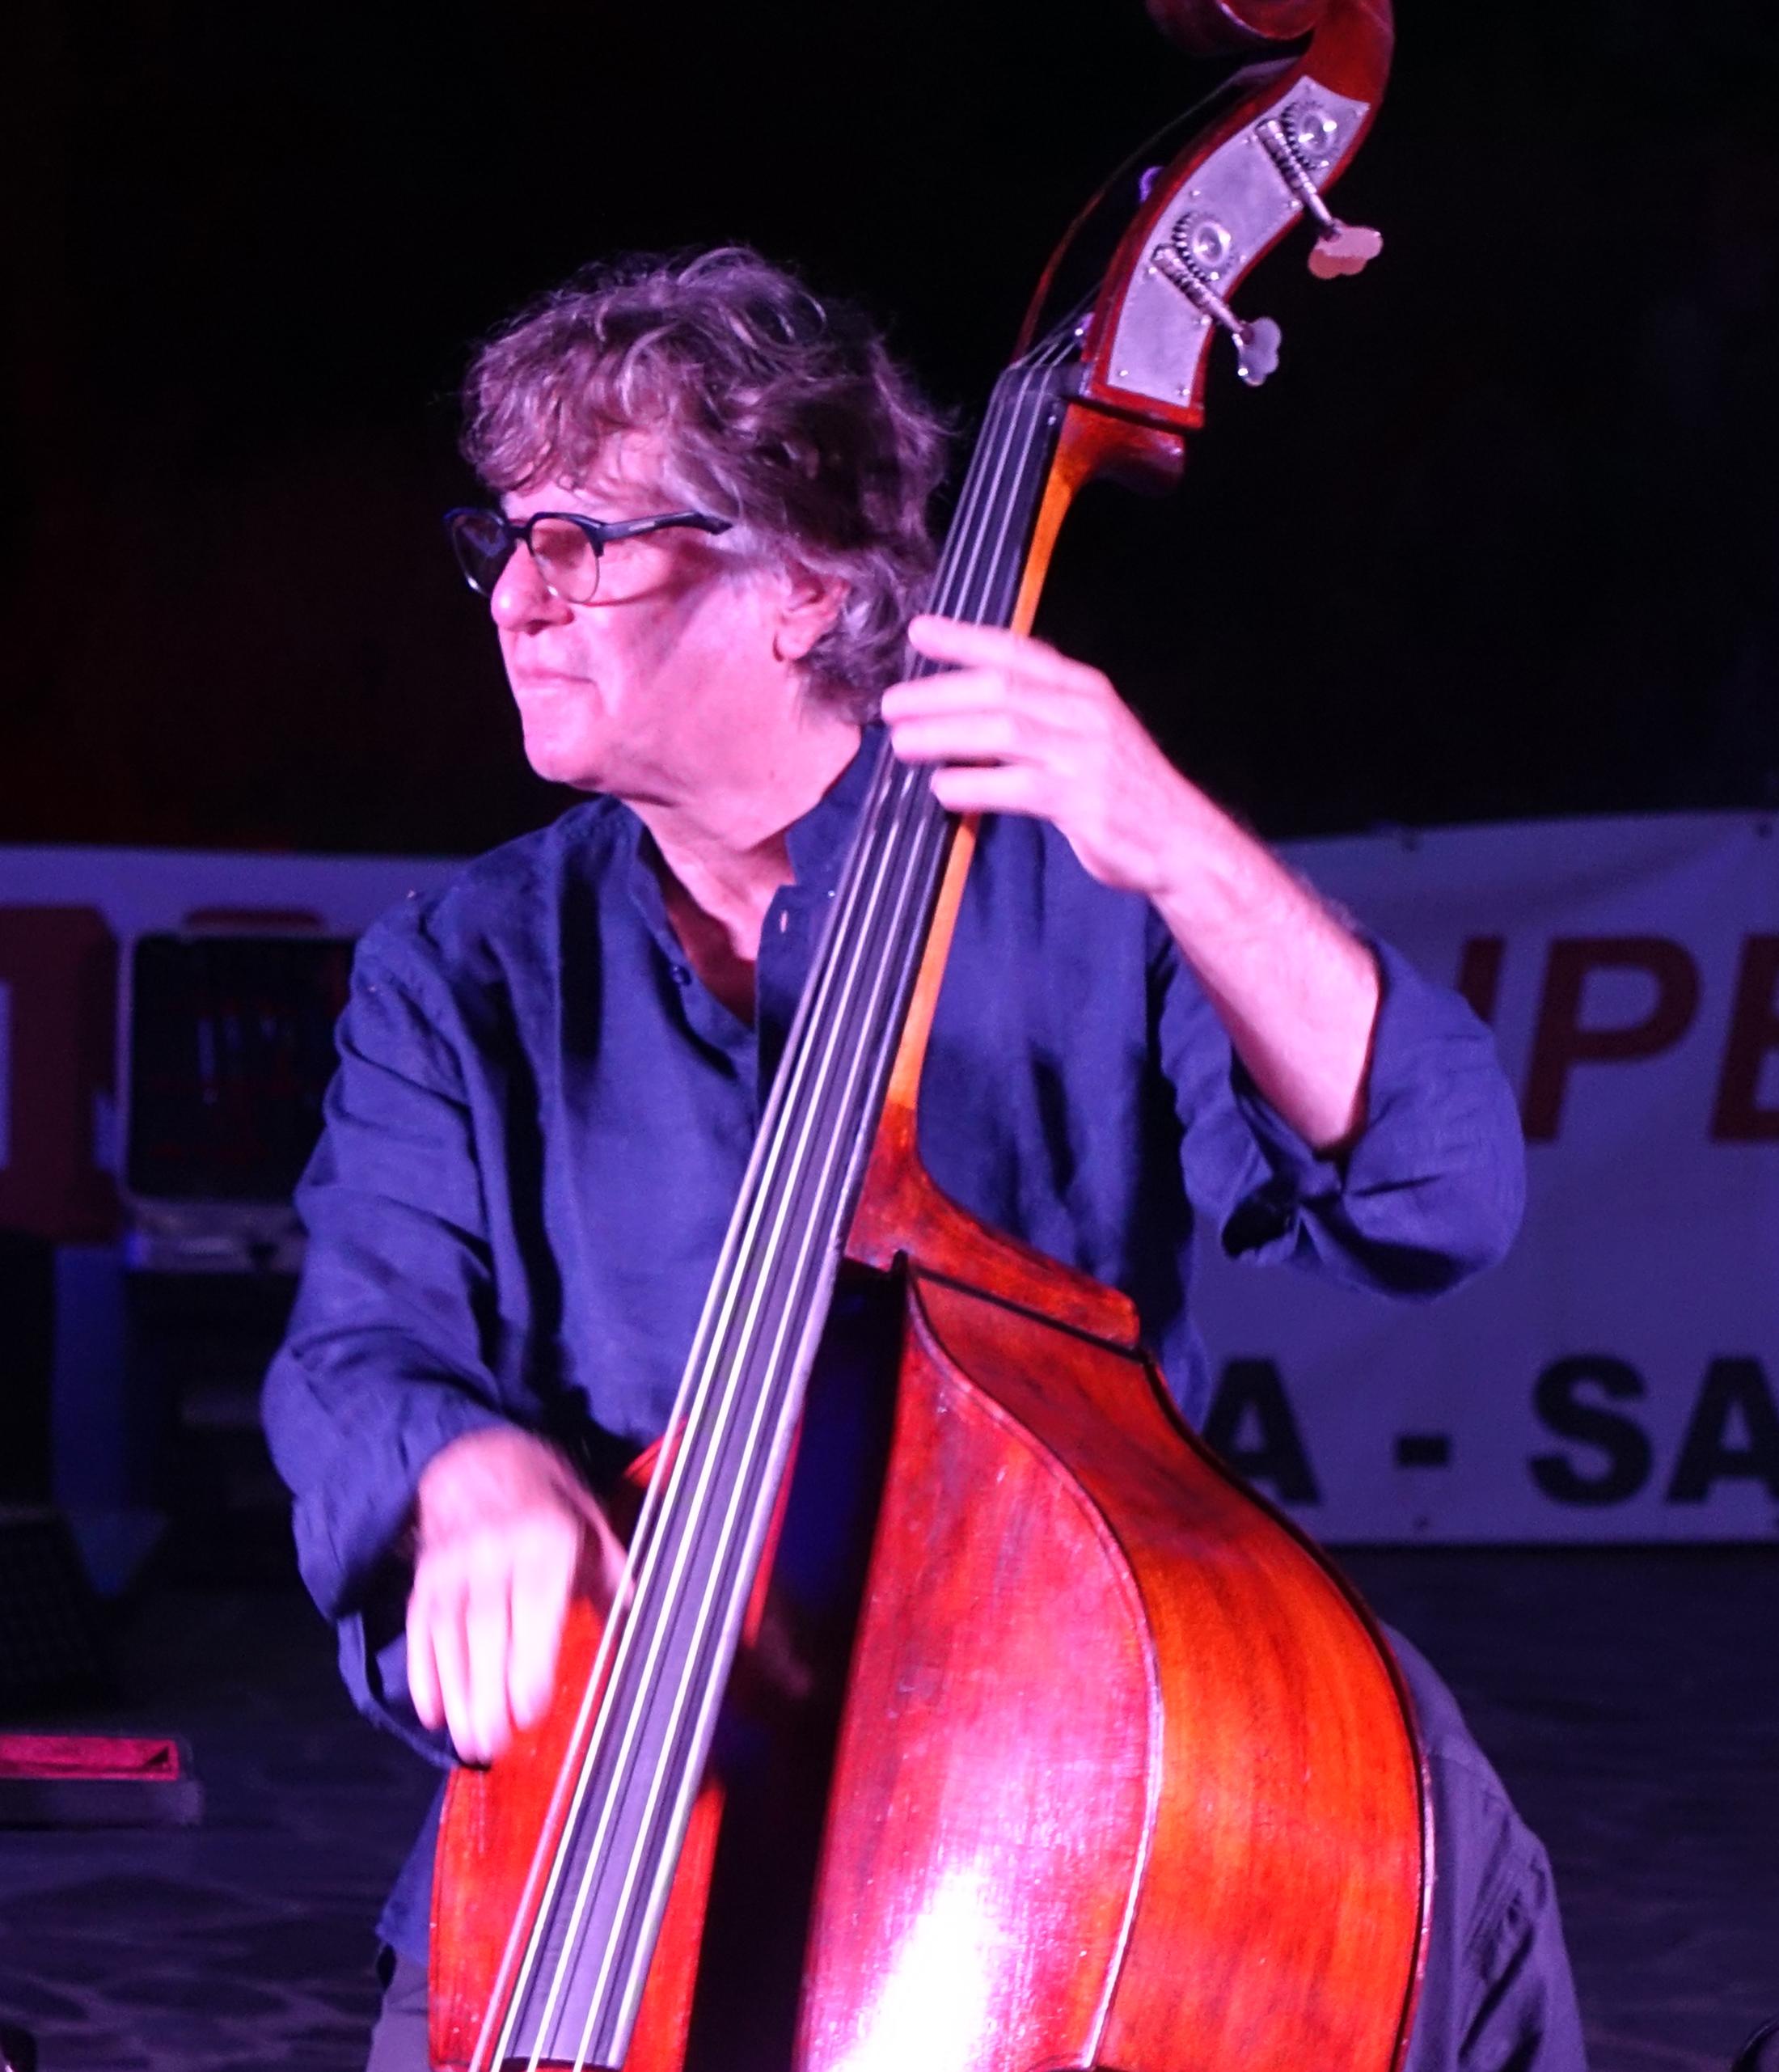 Paolo Damiani in Sant' Anna Arresi Sardinia 2018